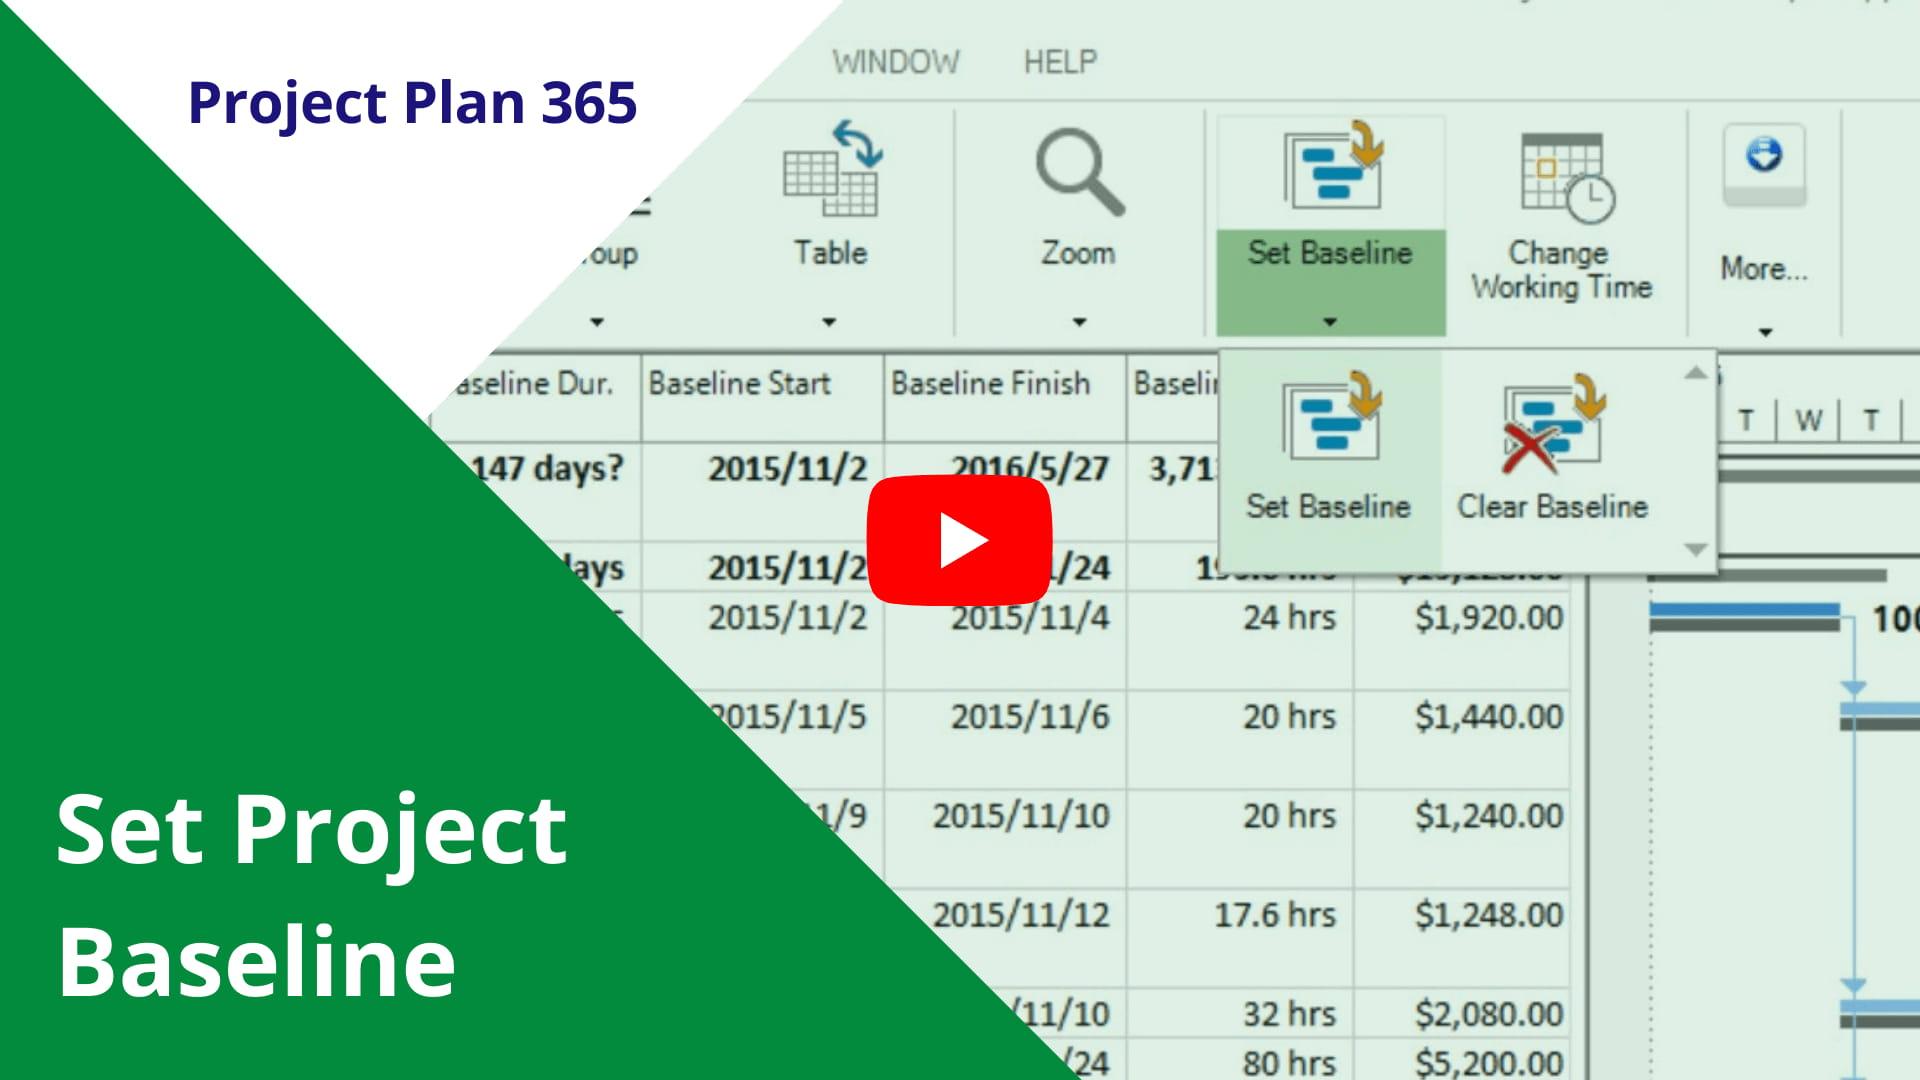 Set Project Baseline